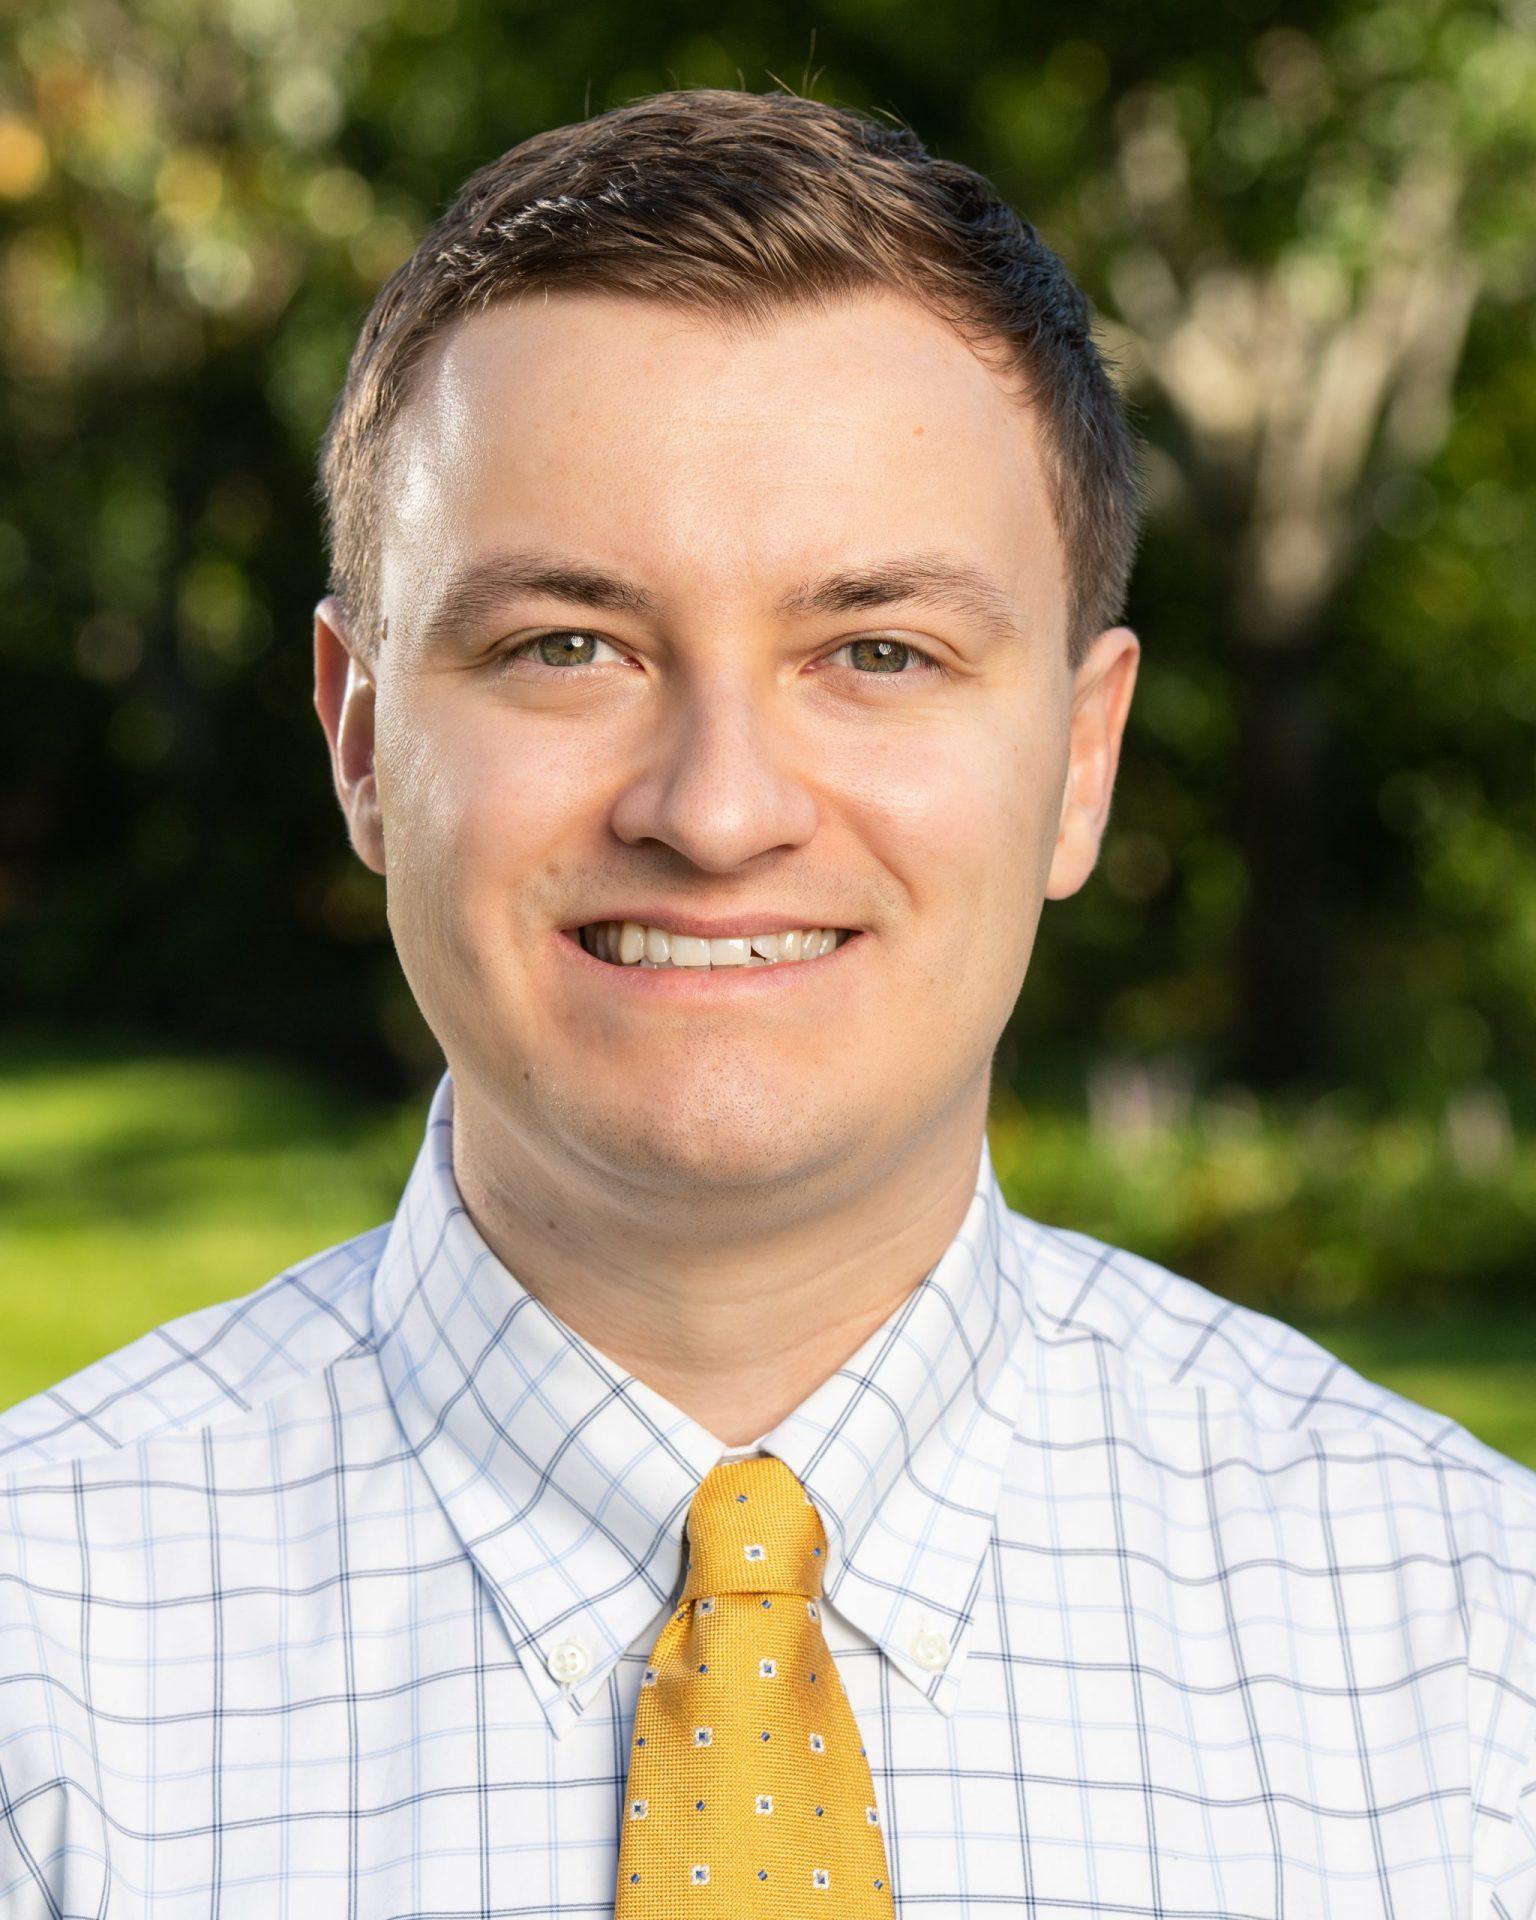 Dentist Dr. Douglas Kebodeaux headshot